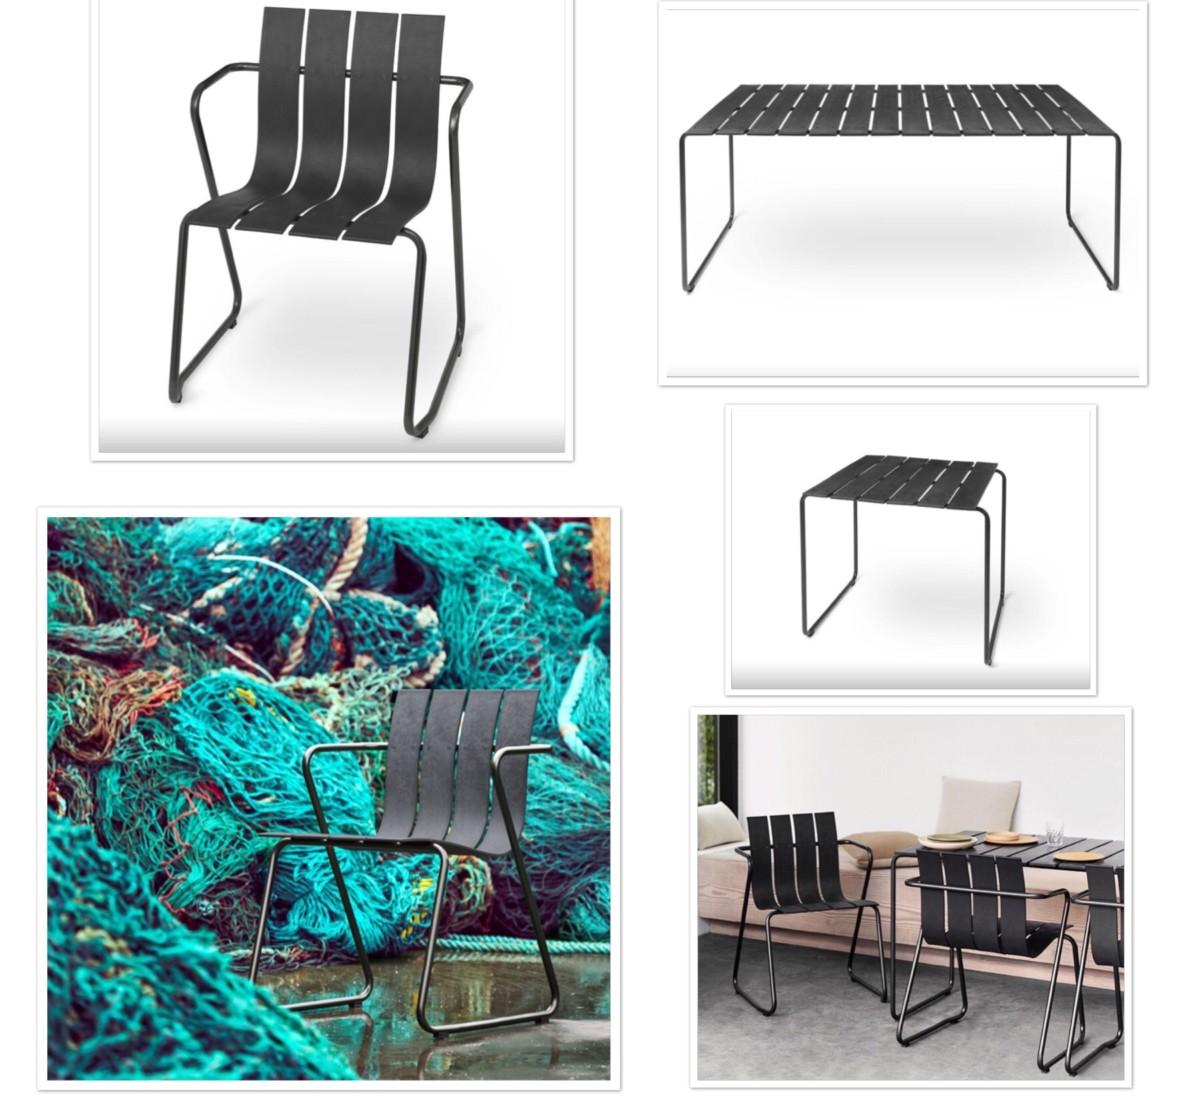 Bærekraftig hagemøbler